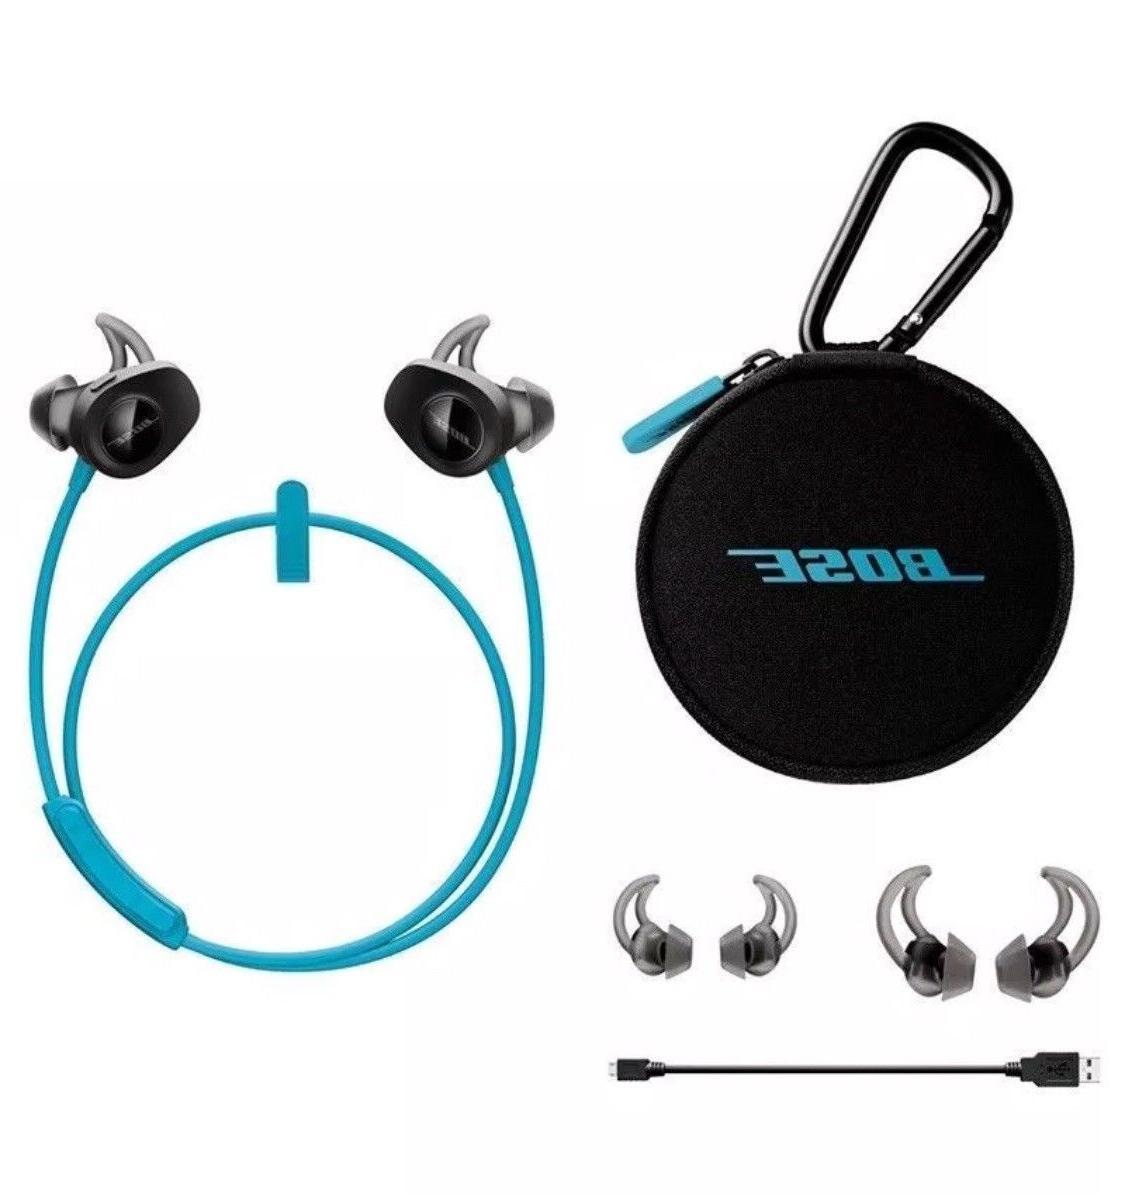 soundsport wireless in ear bluetooth headphones nfc